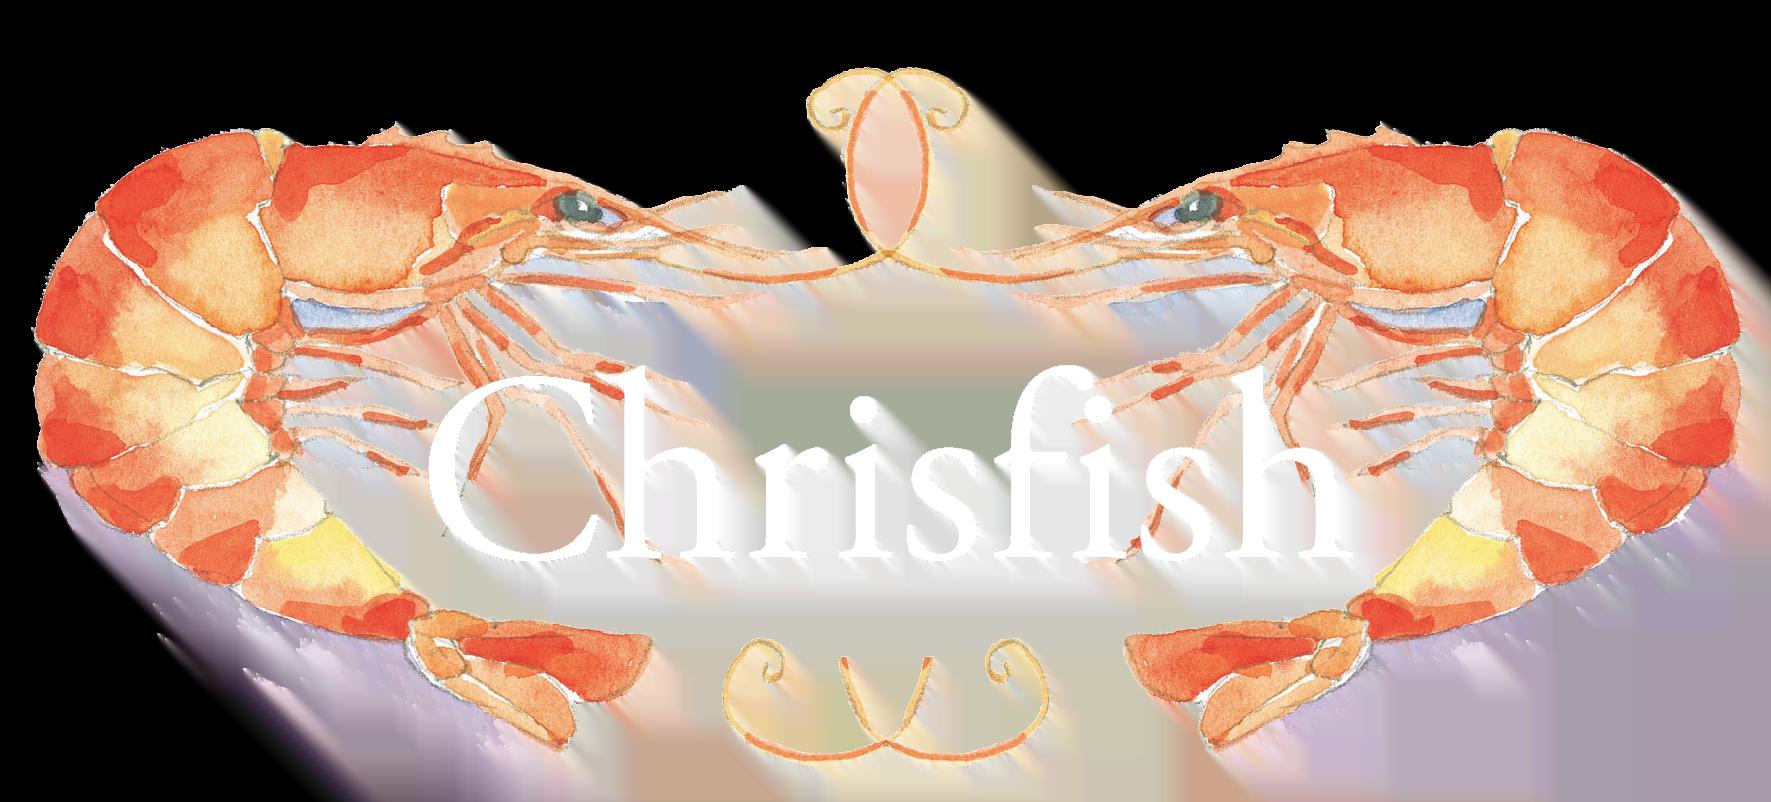 https://podi.dk/wp-content/uploads/2021/02/Chrisfish_samletlogo_highres_medium-12.png